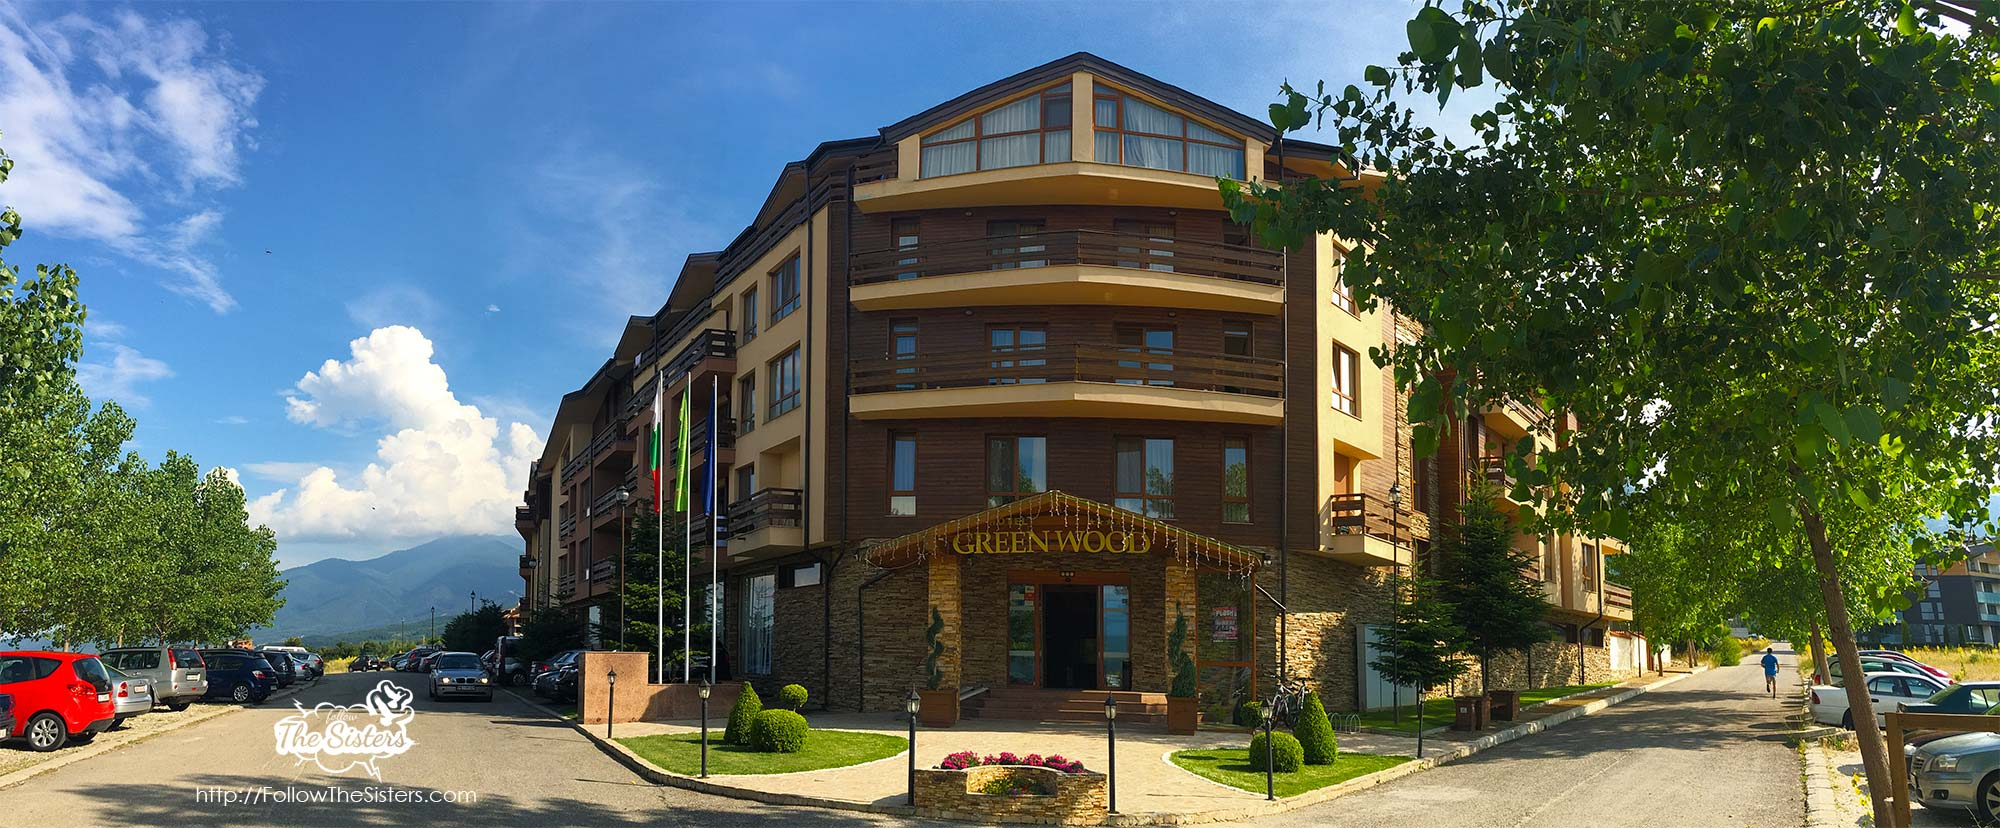 Hotel Bansko Spa And Holidays